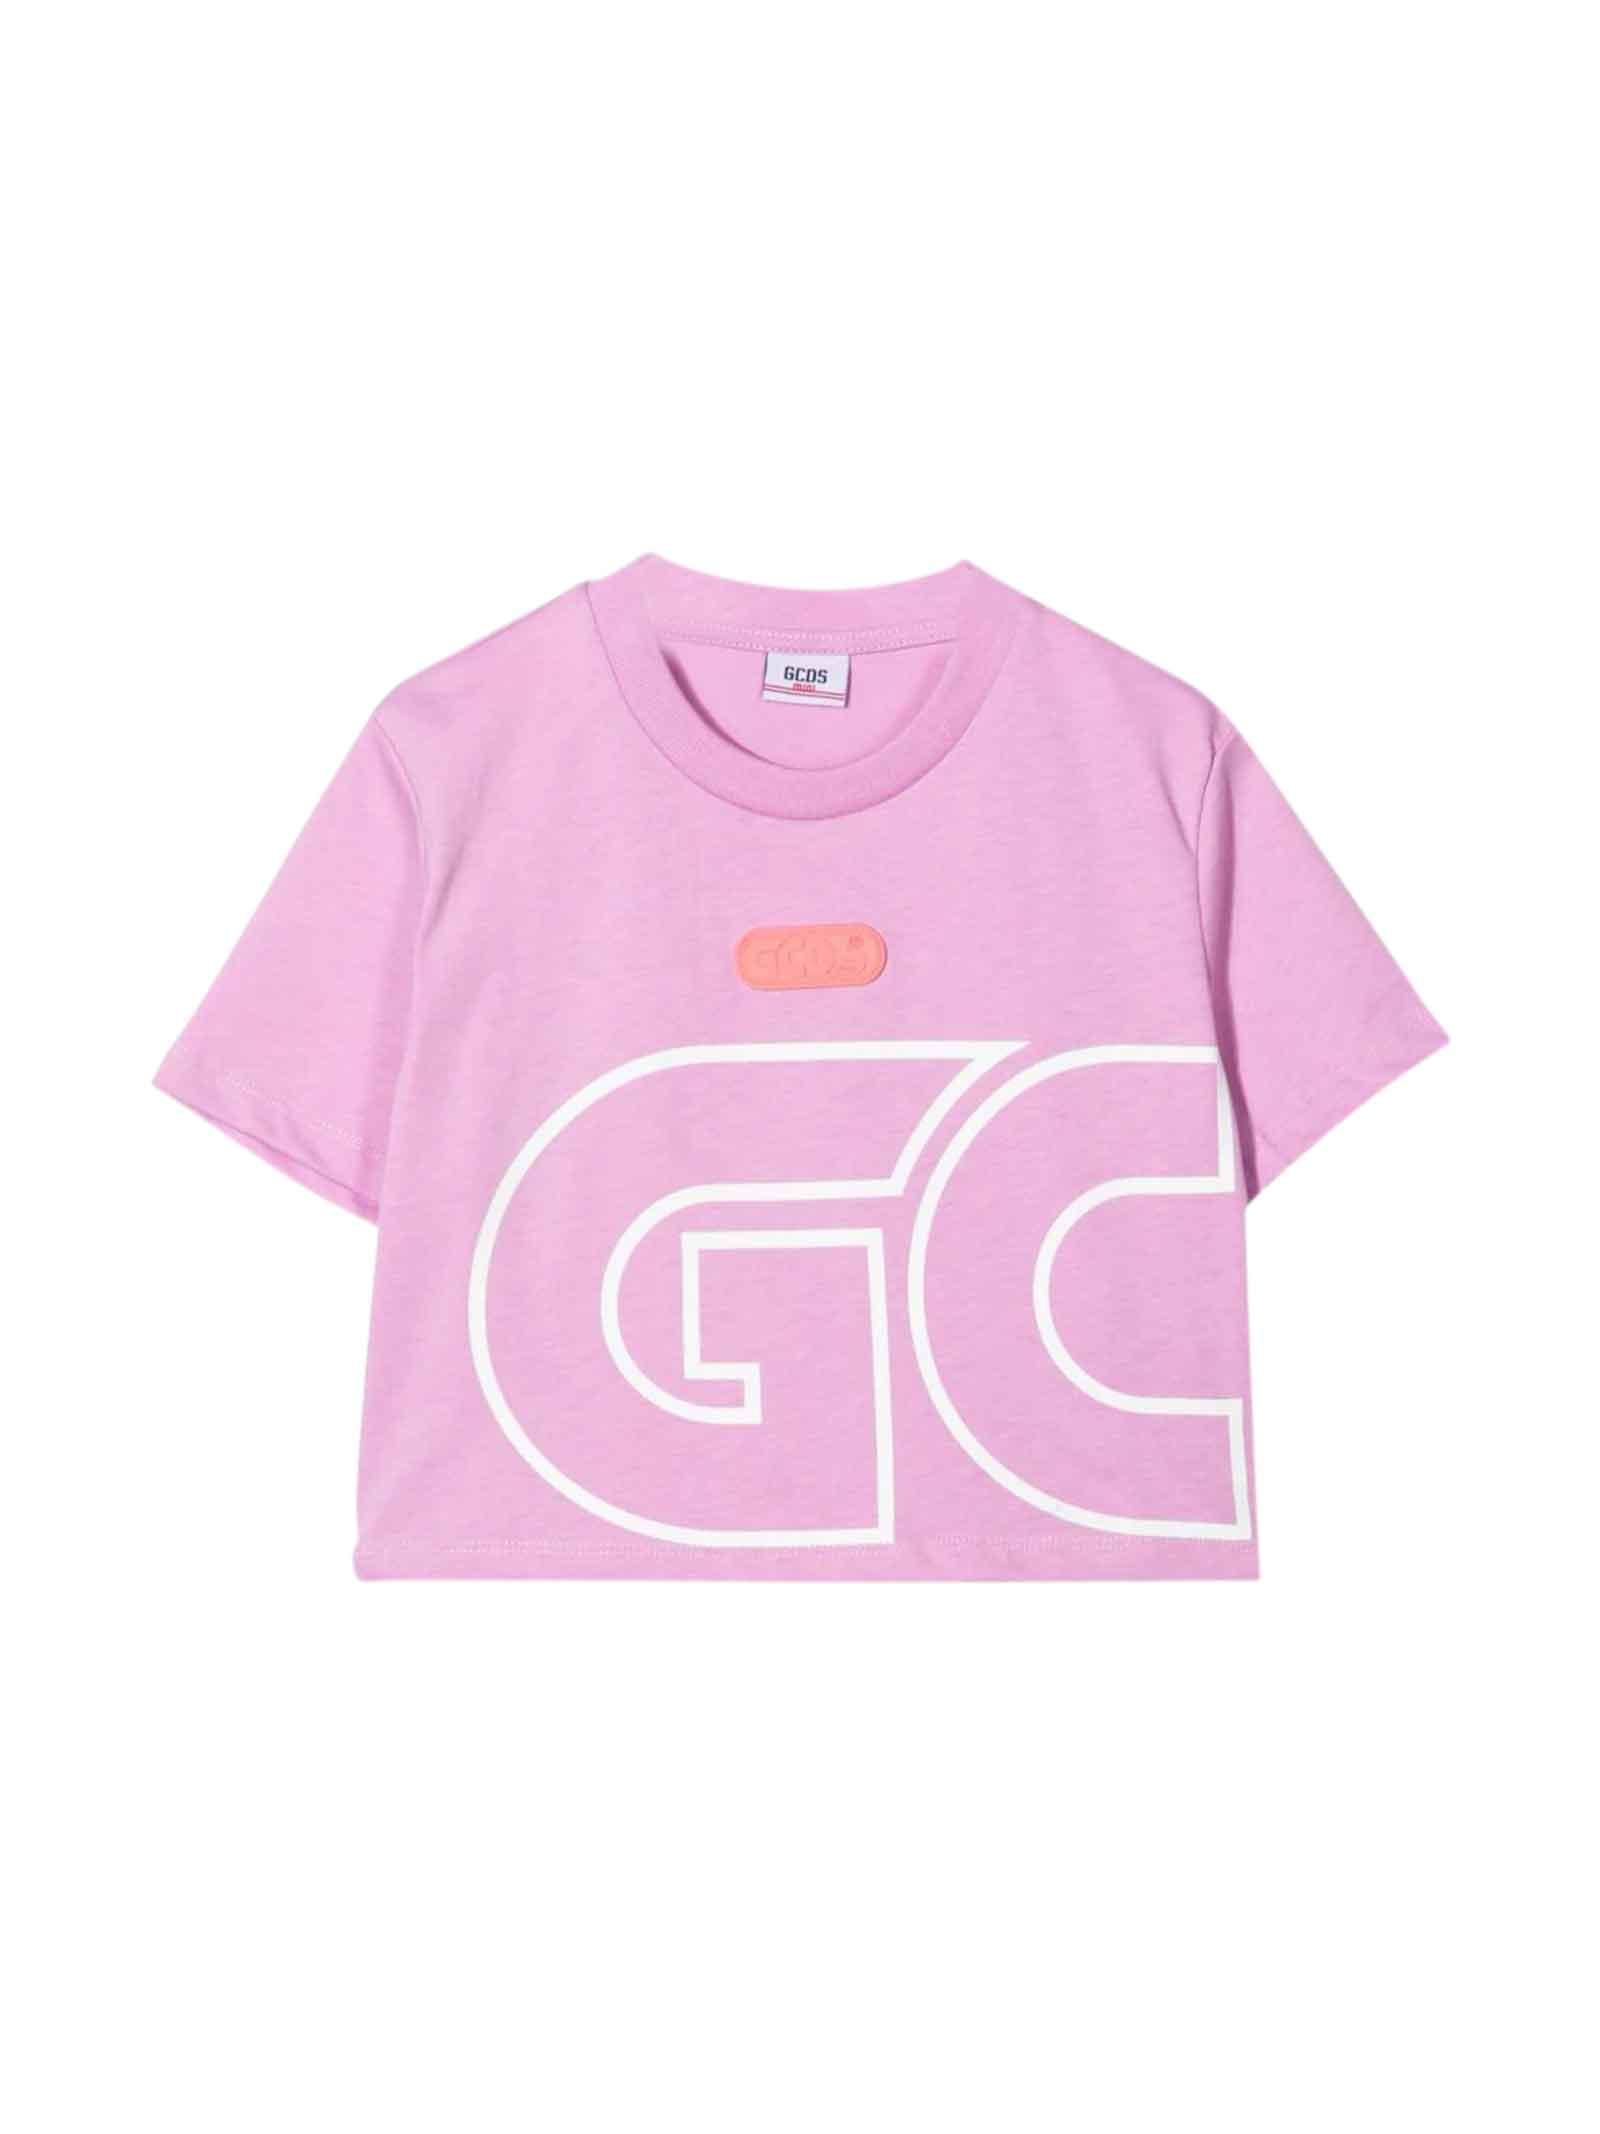 Lilac Teen T-shirt